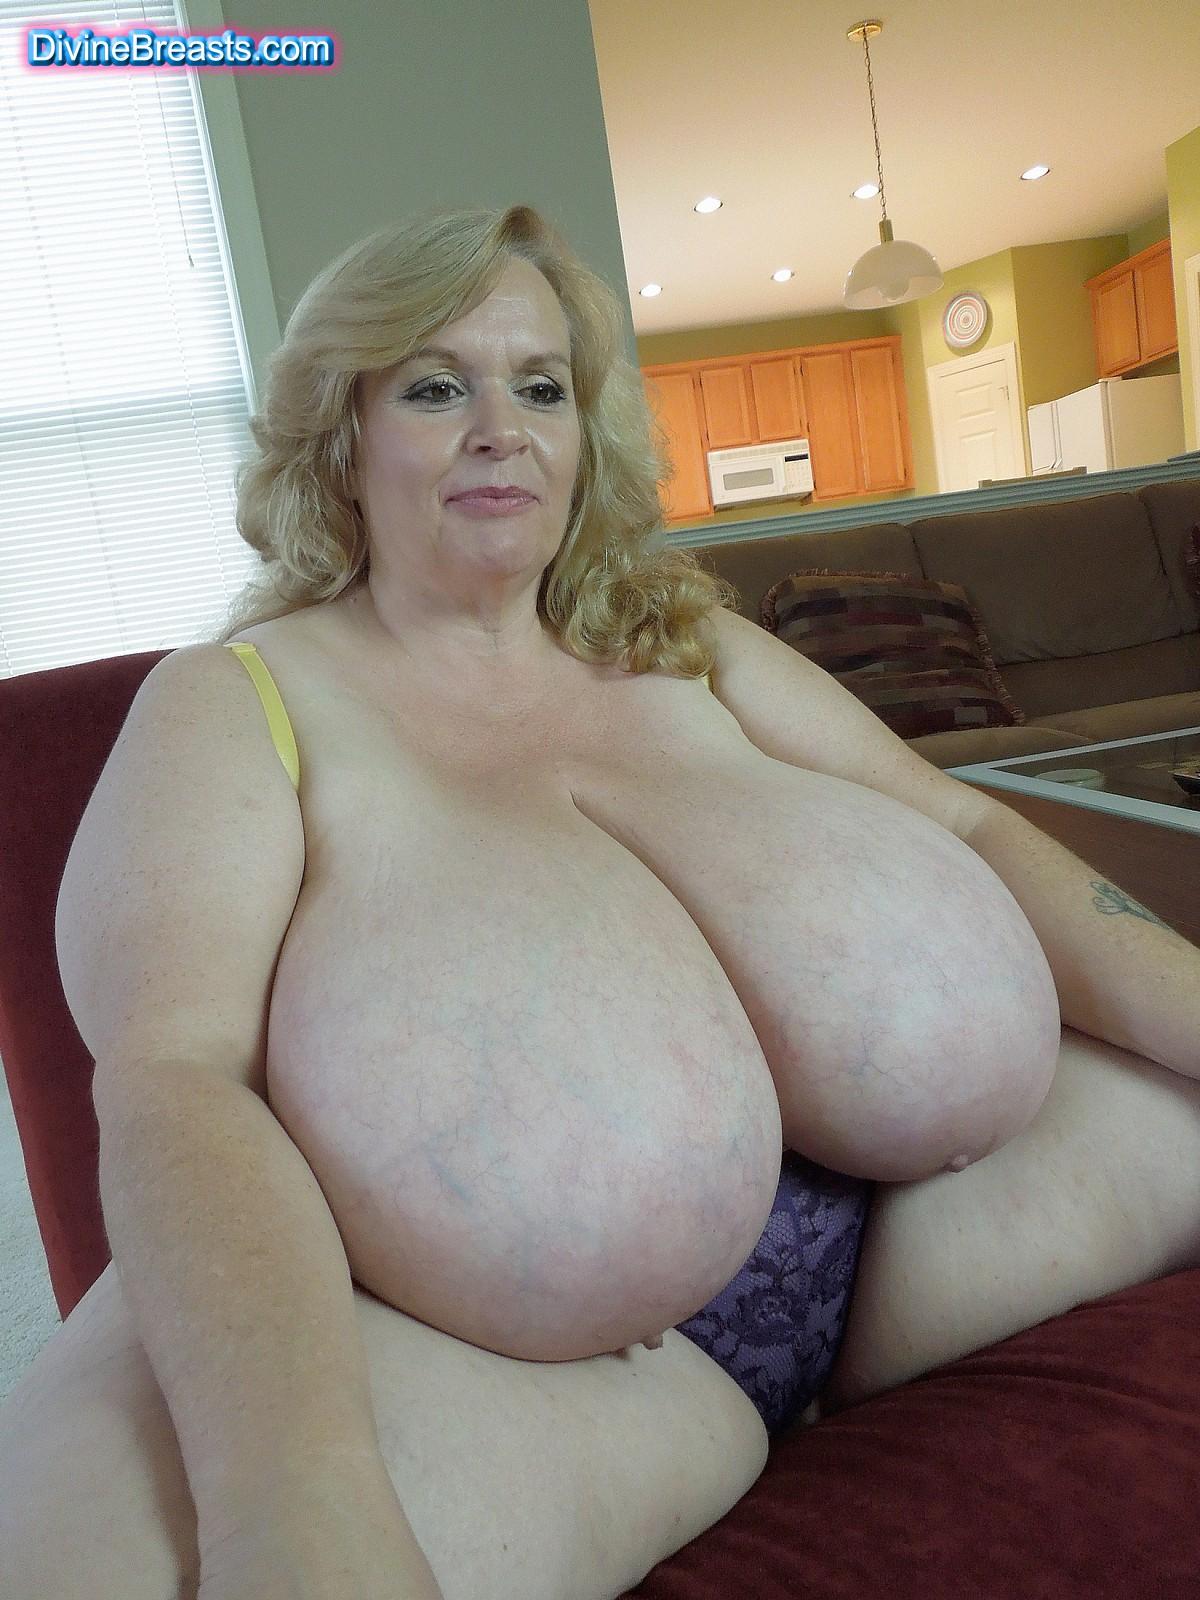 Amanda cerny hot photos